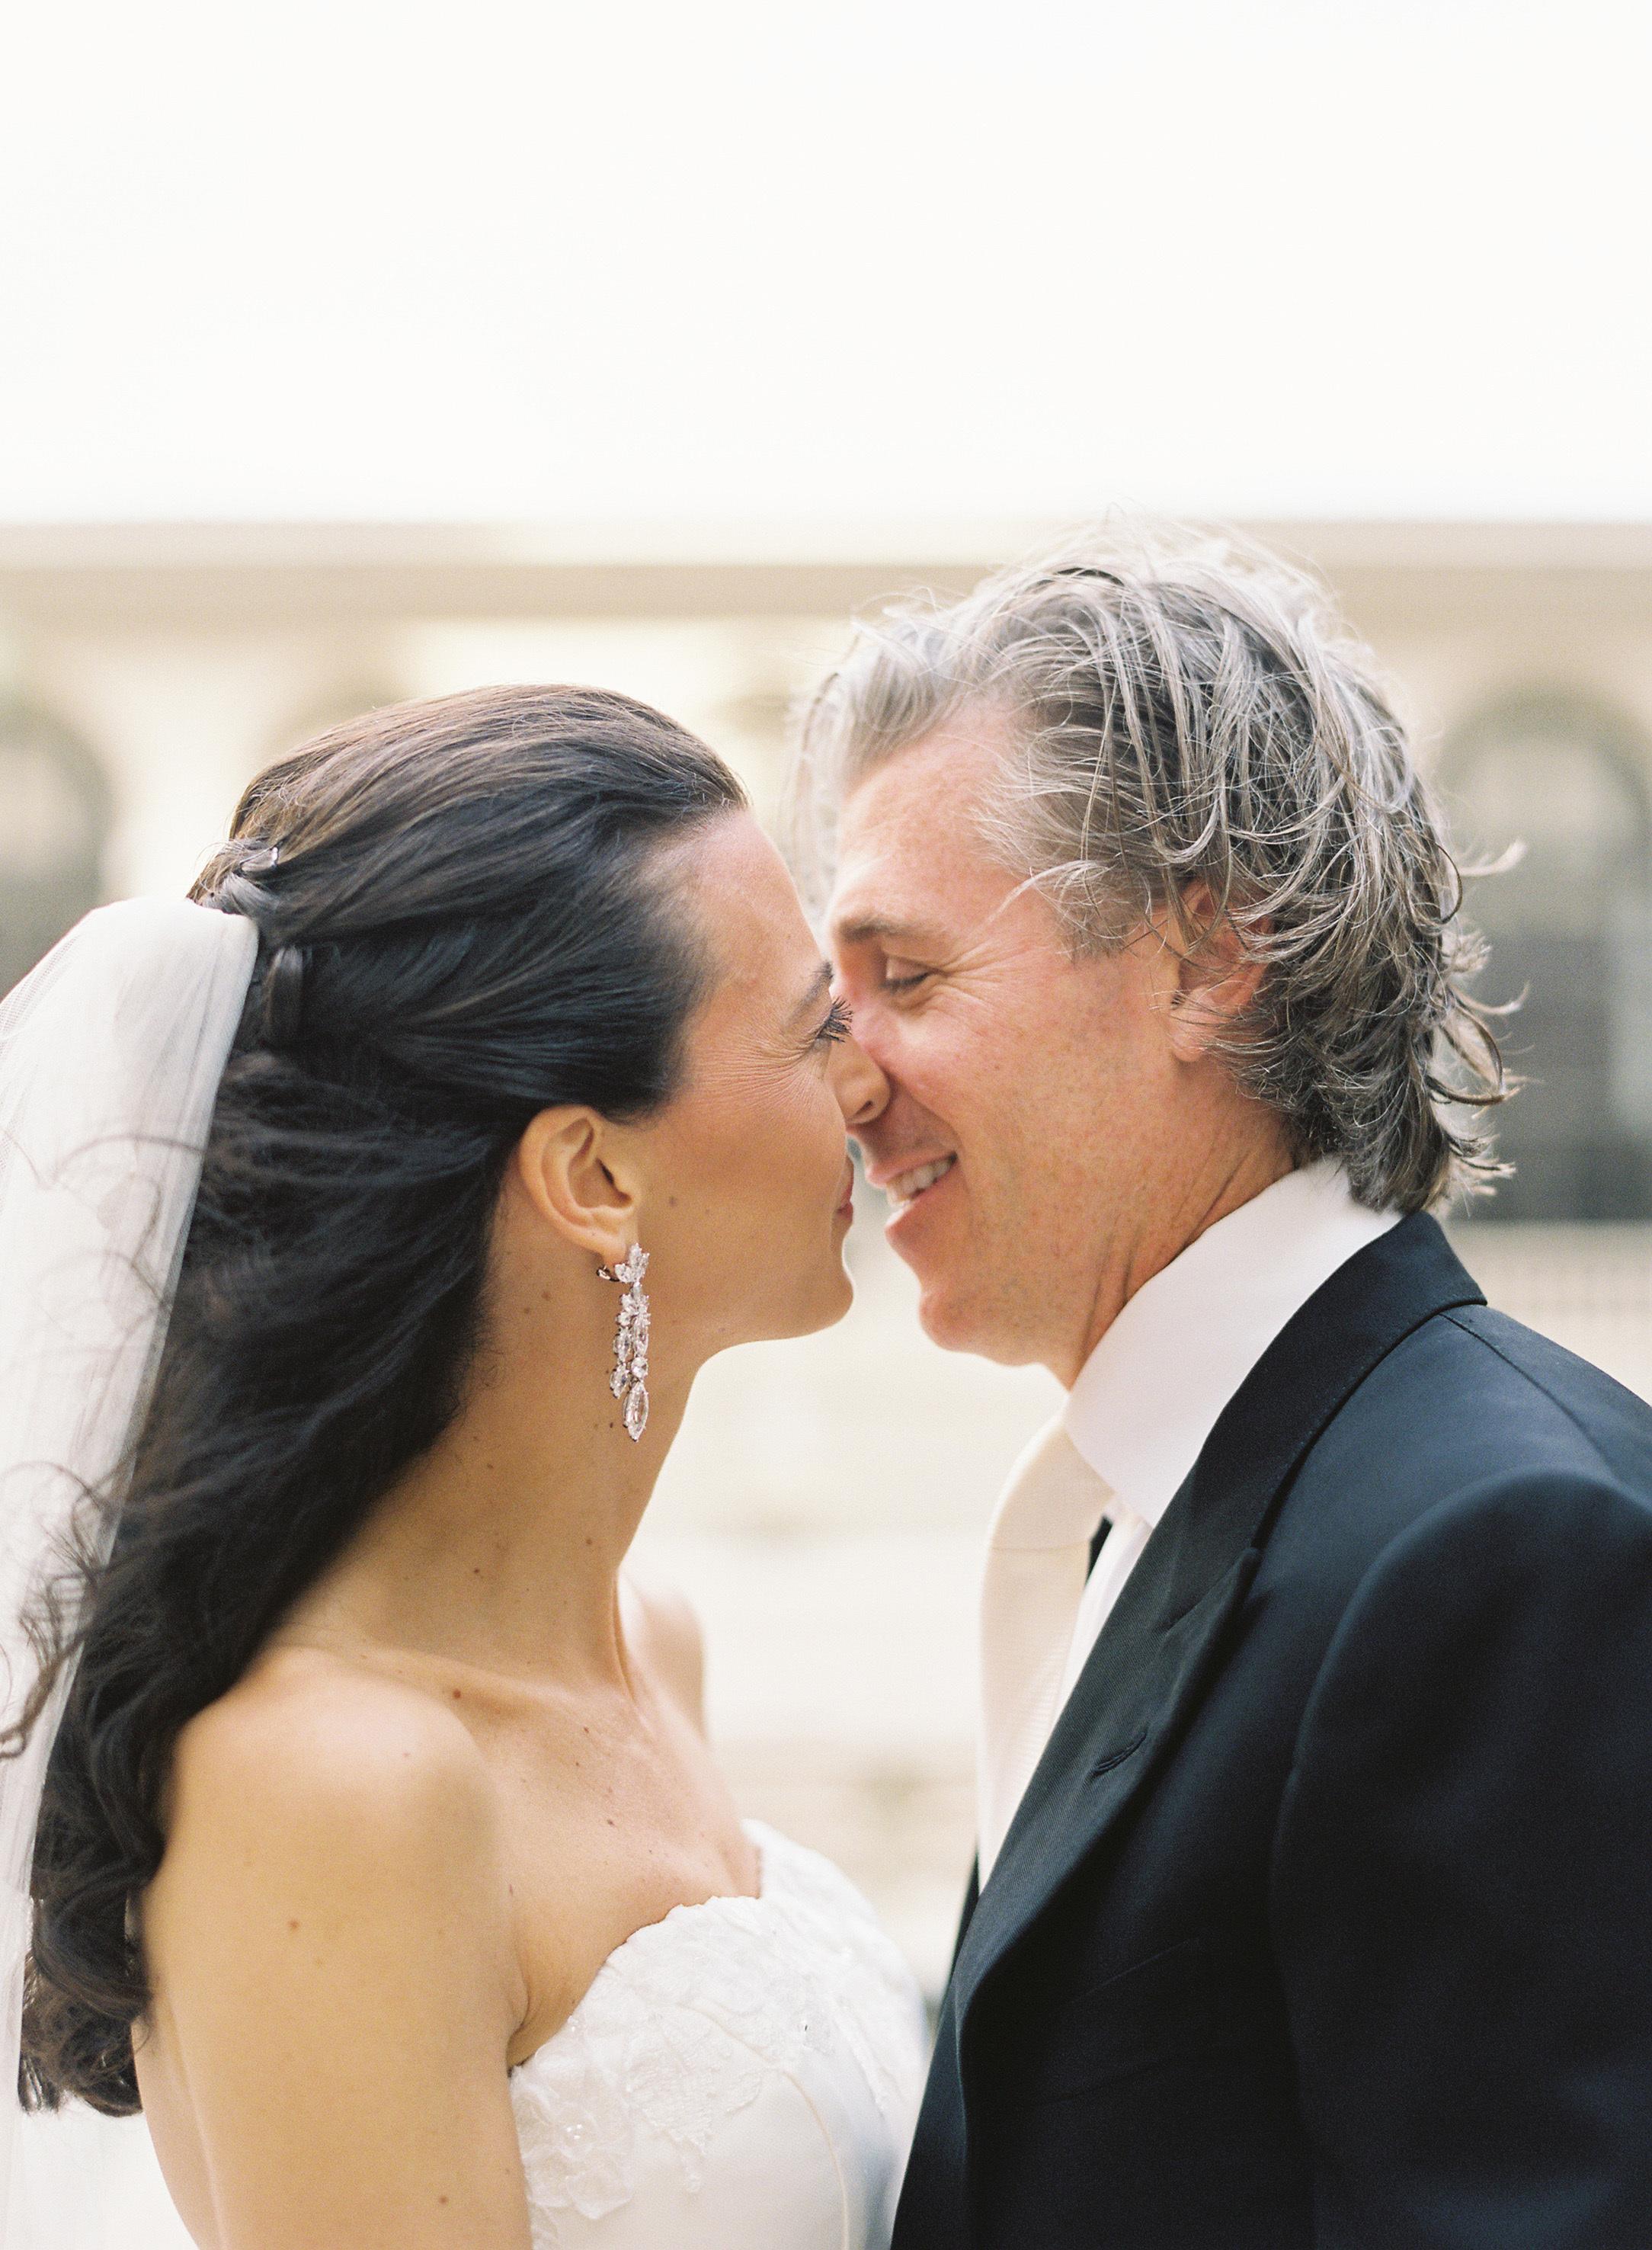 Real Weddings, Classic, Southern Real Weddings, Portrait, Kiss, Elegant, Florida, Southern weddings, florida real weddings, florida weddings